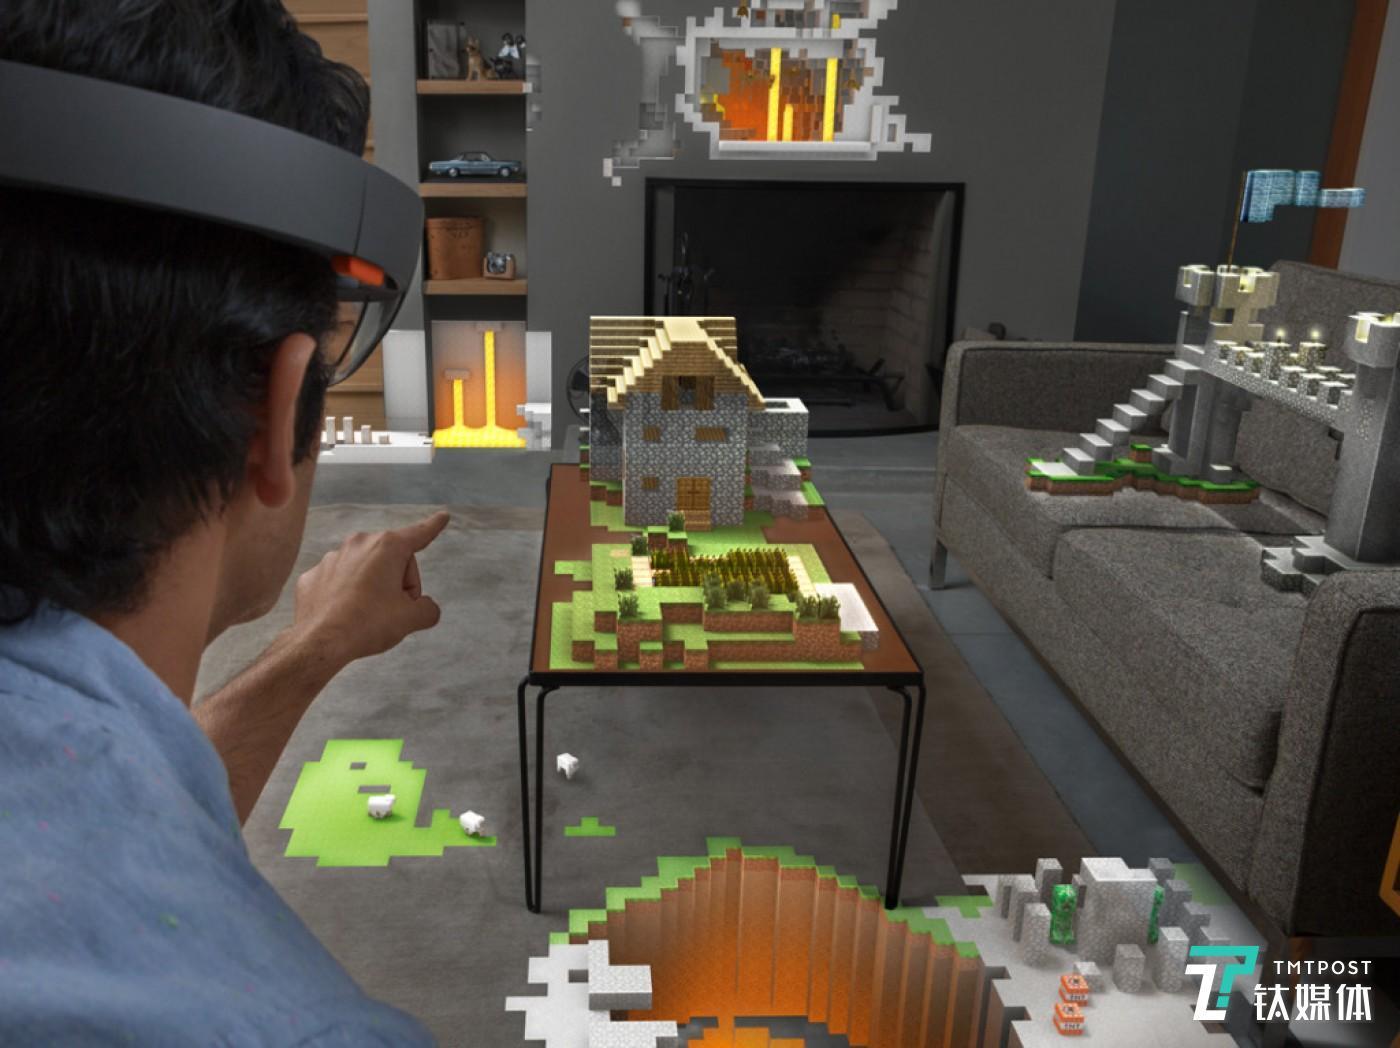 Hololens 为《我的世界》带来新的游戏体验